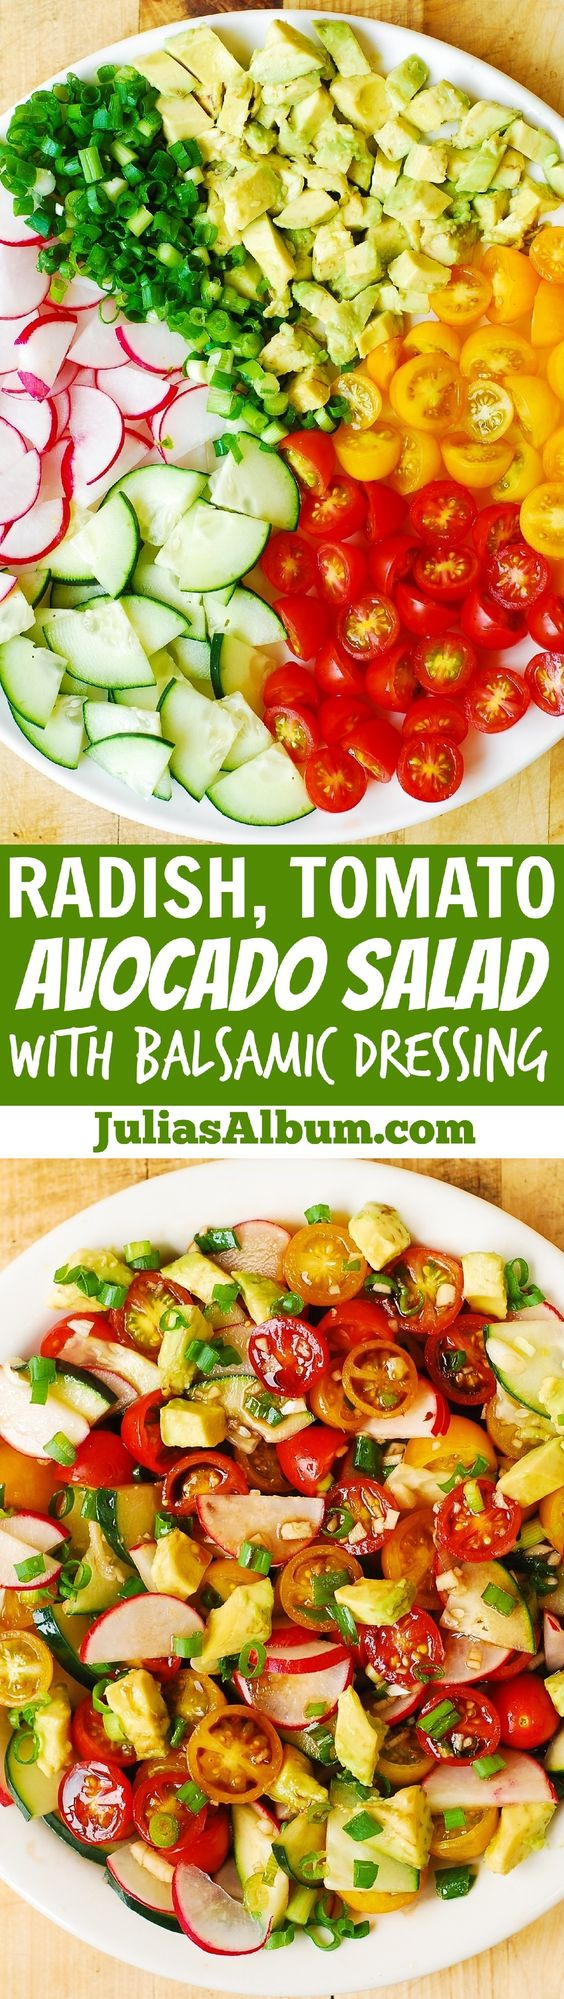 Radish Tomato Avocado Salad with Balsamic Dressing | Recipe | Avocado ...